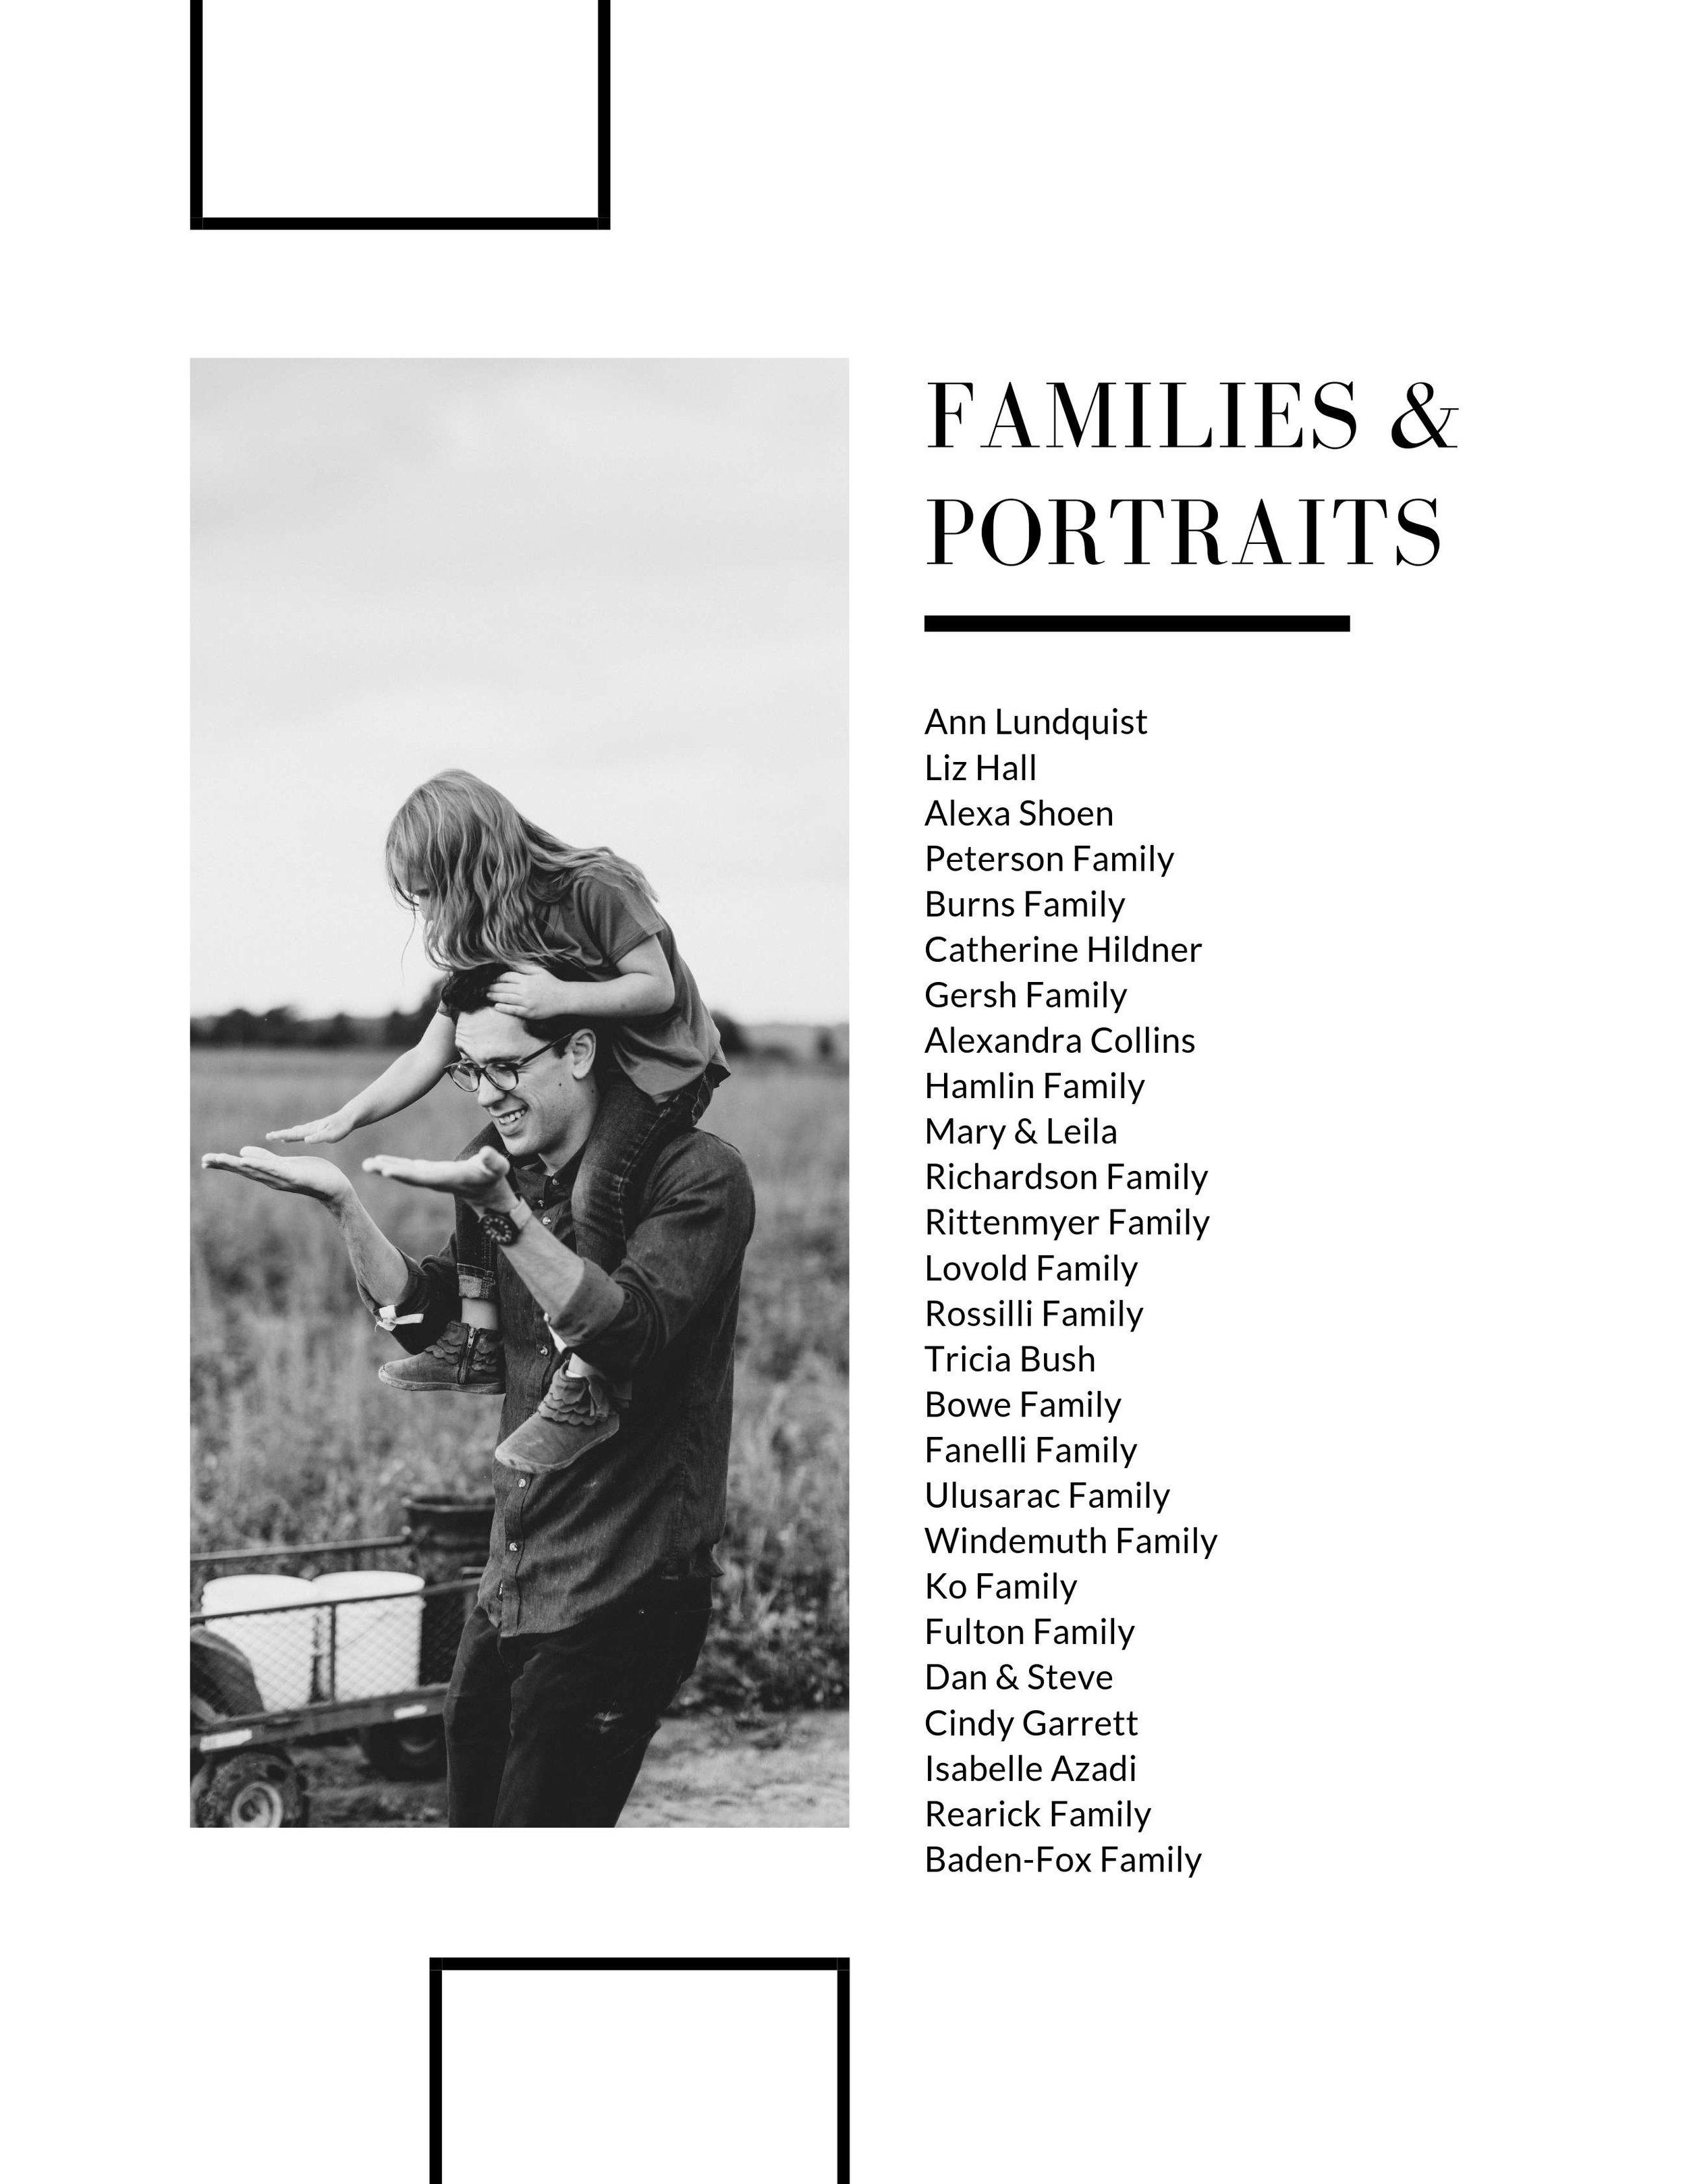 Large FAMILIES & PORTRAITS.jpg